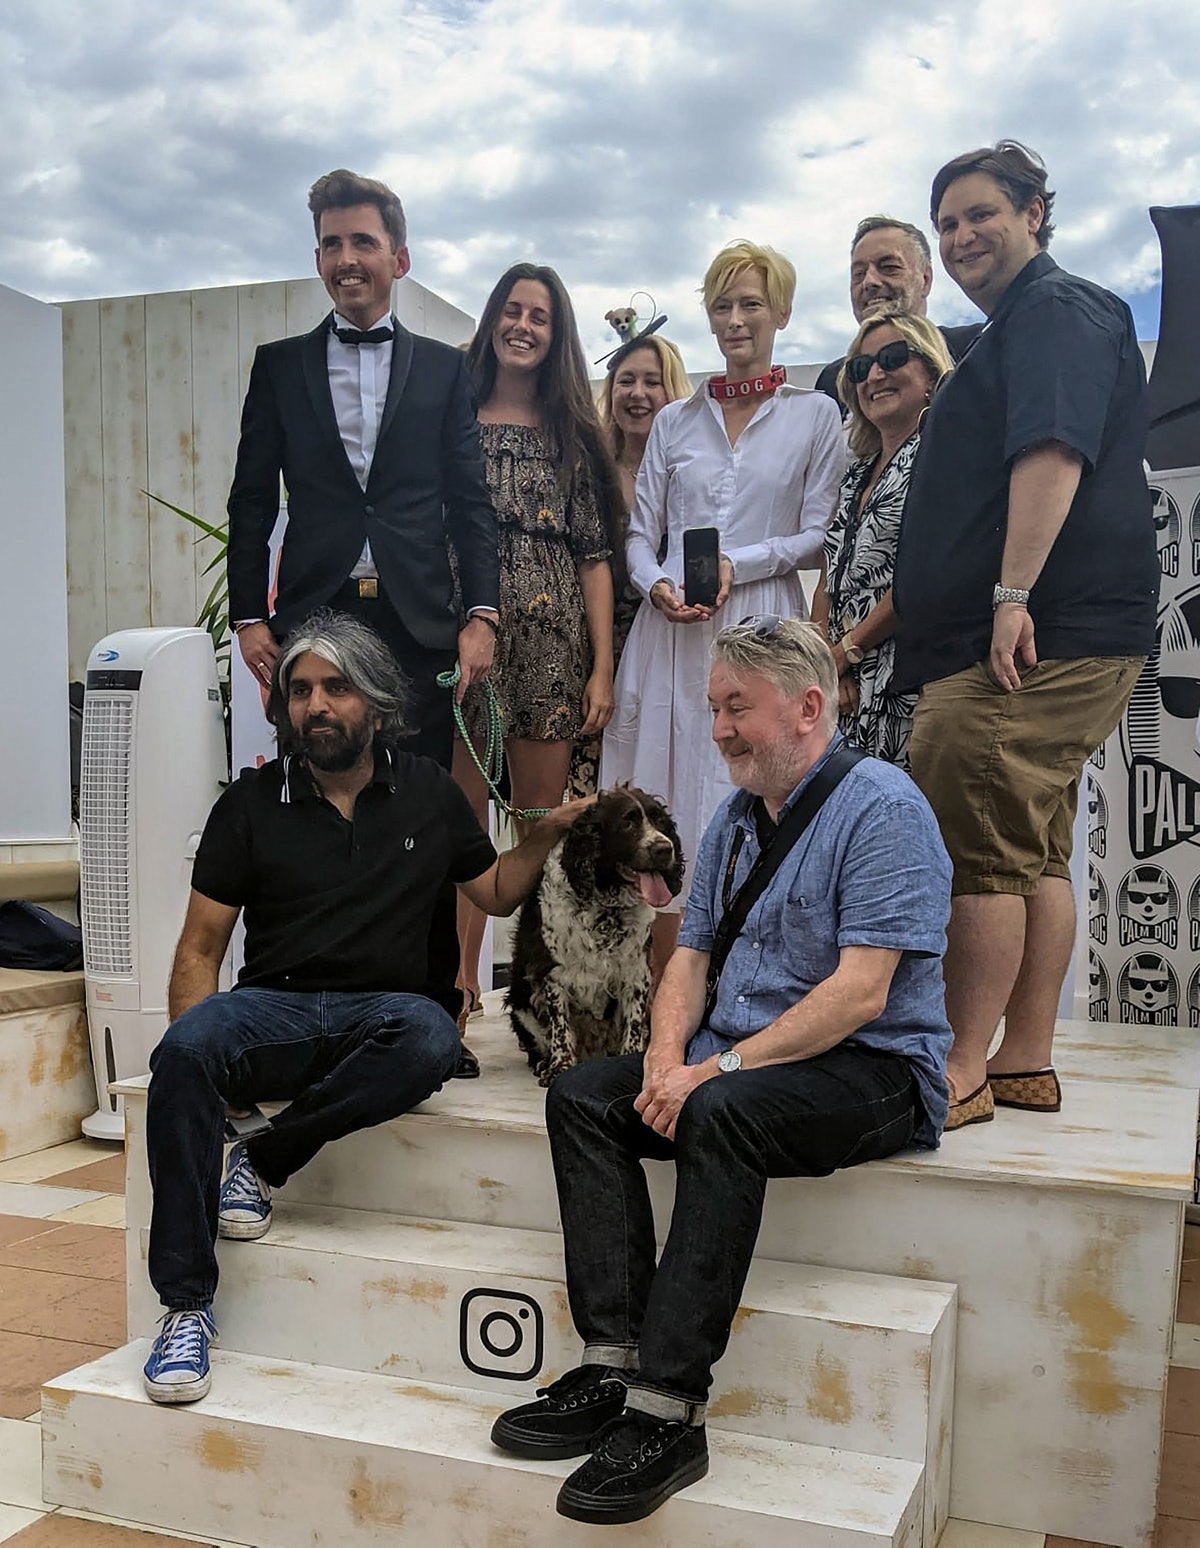 Tilda Swinton accepting the Palm Dog award on behalf of her dogs